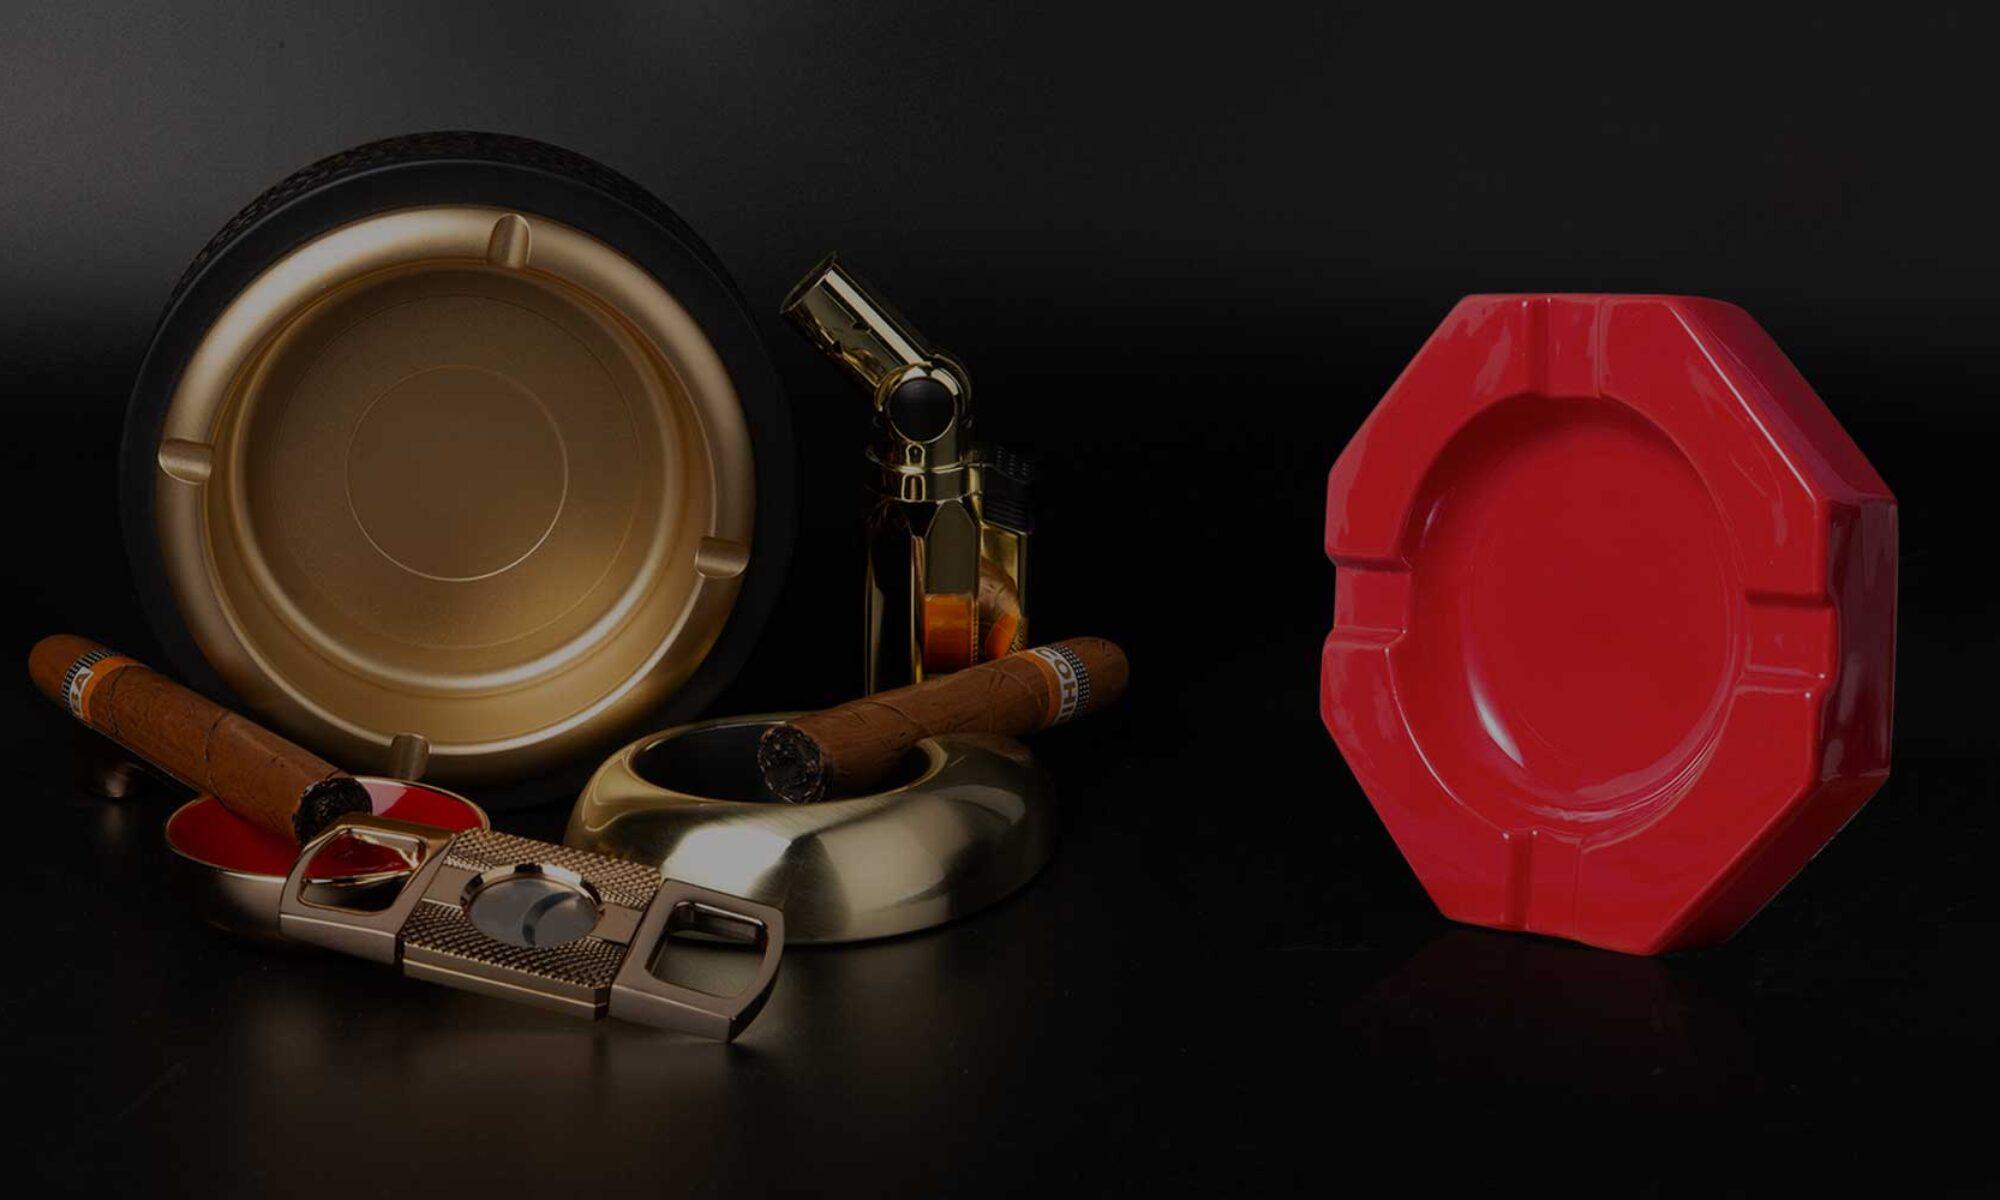 China Smoking Accessories ltd. manufacturers, supplies.